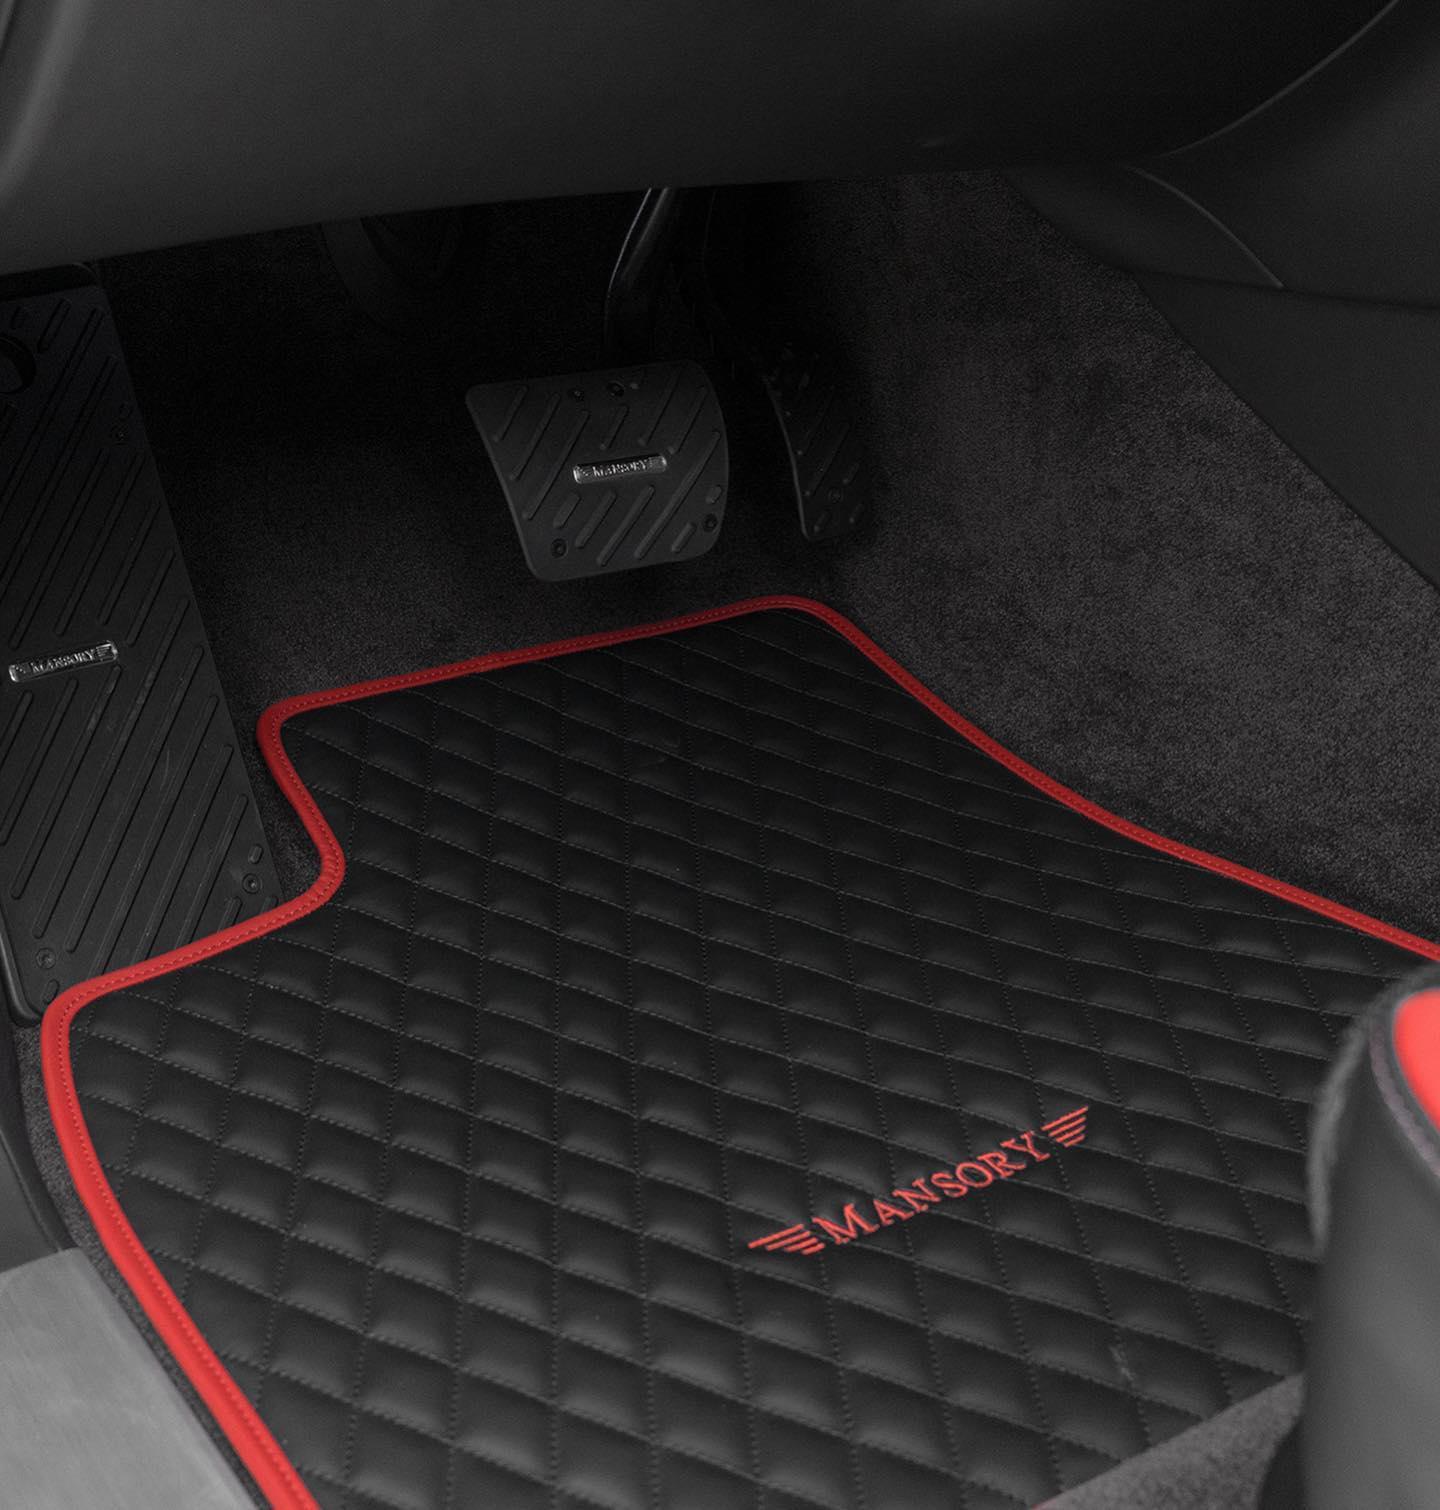 Bentley-Bentayga-Facelift-by-Mansory-16